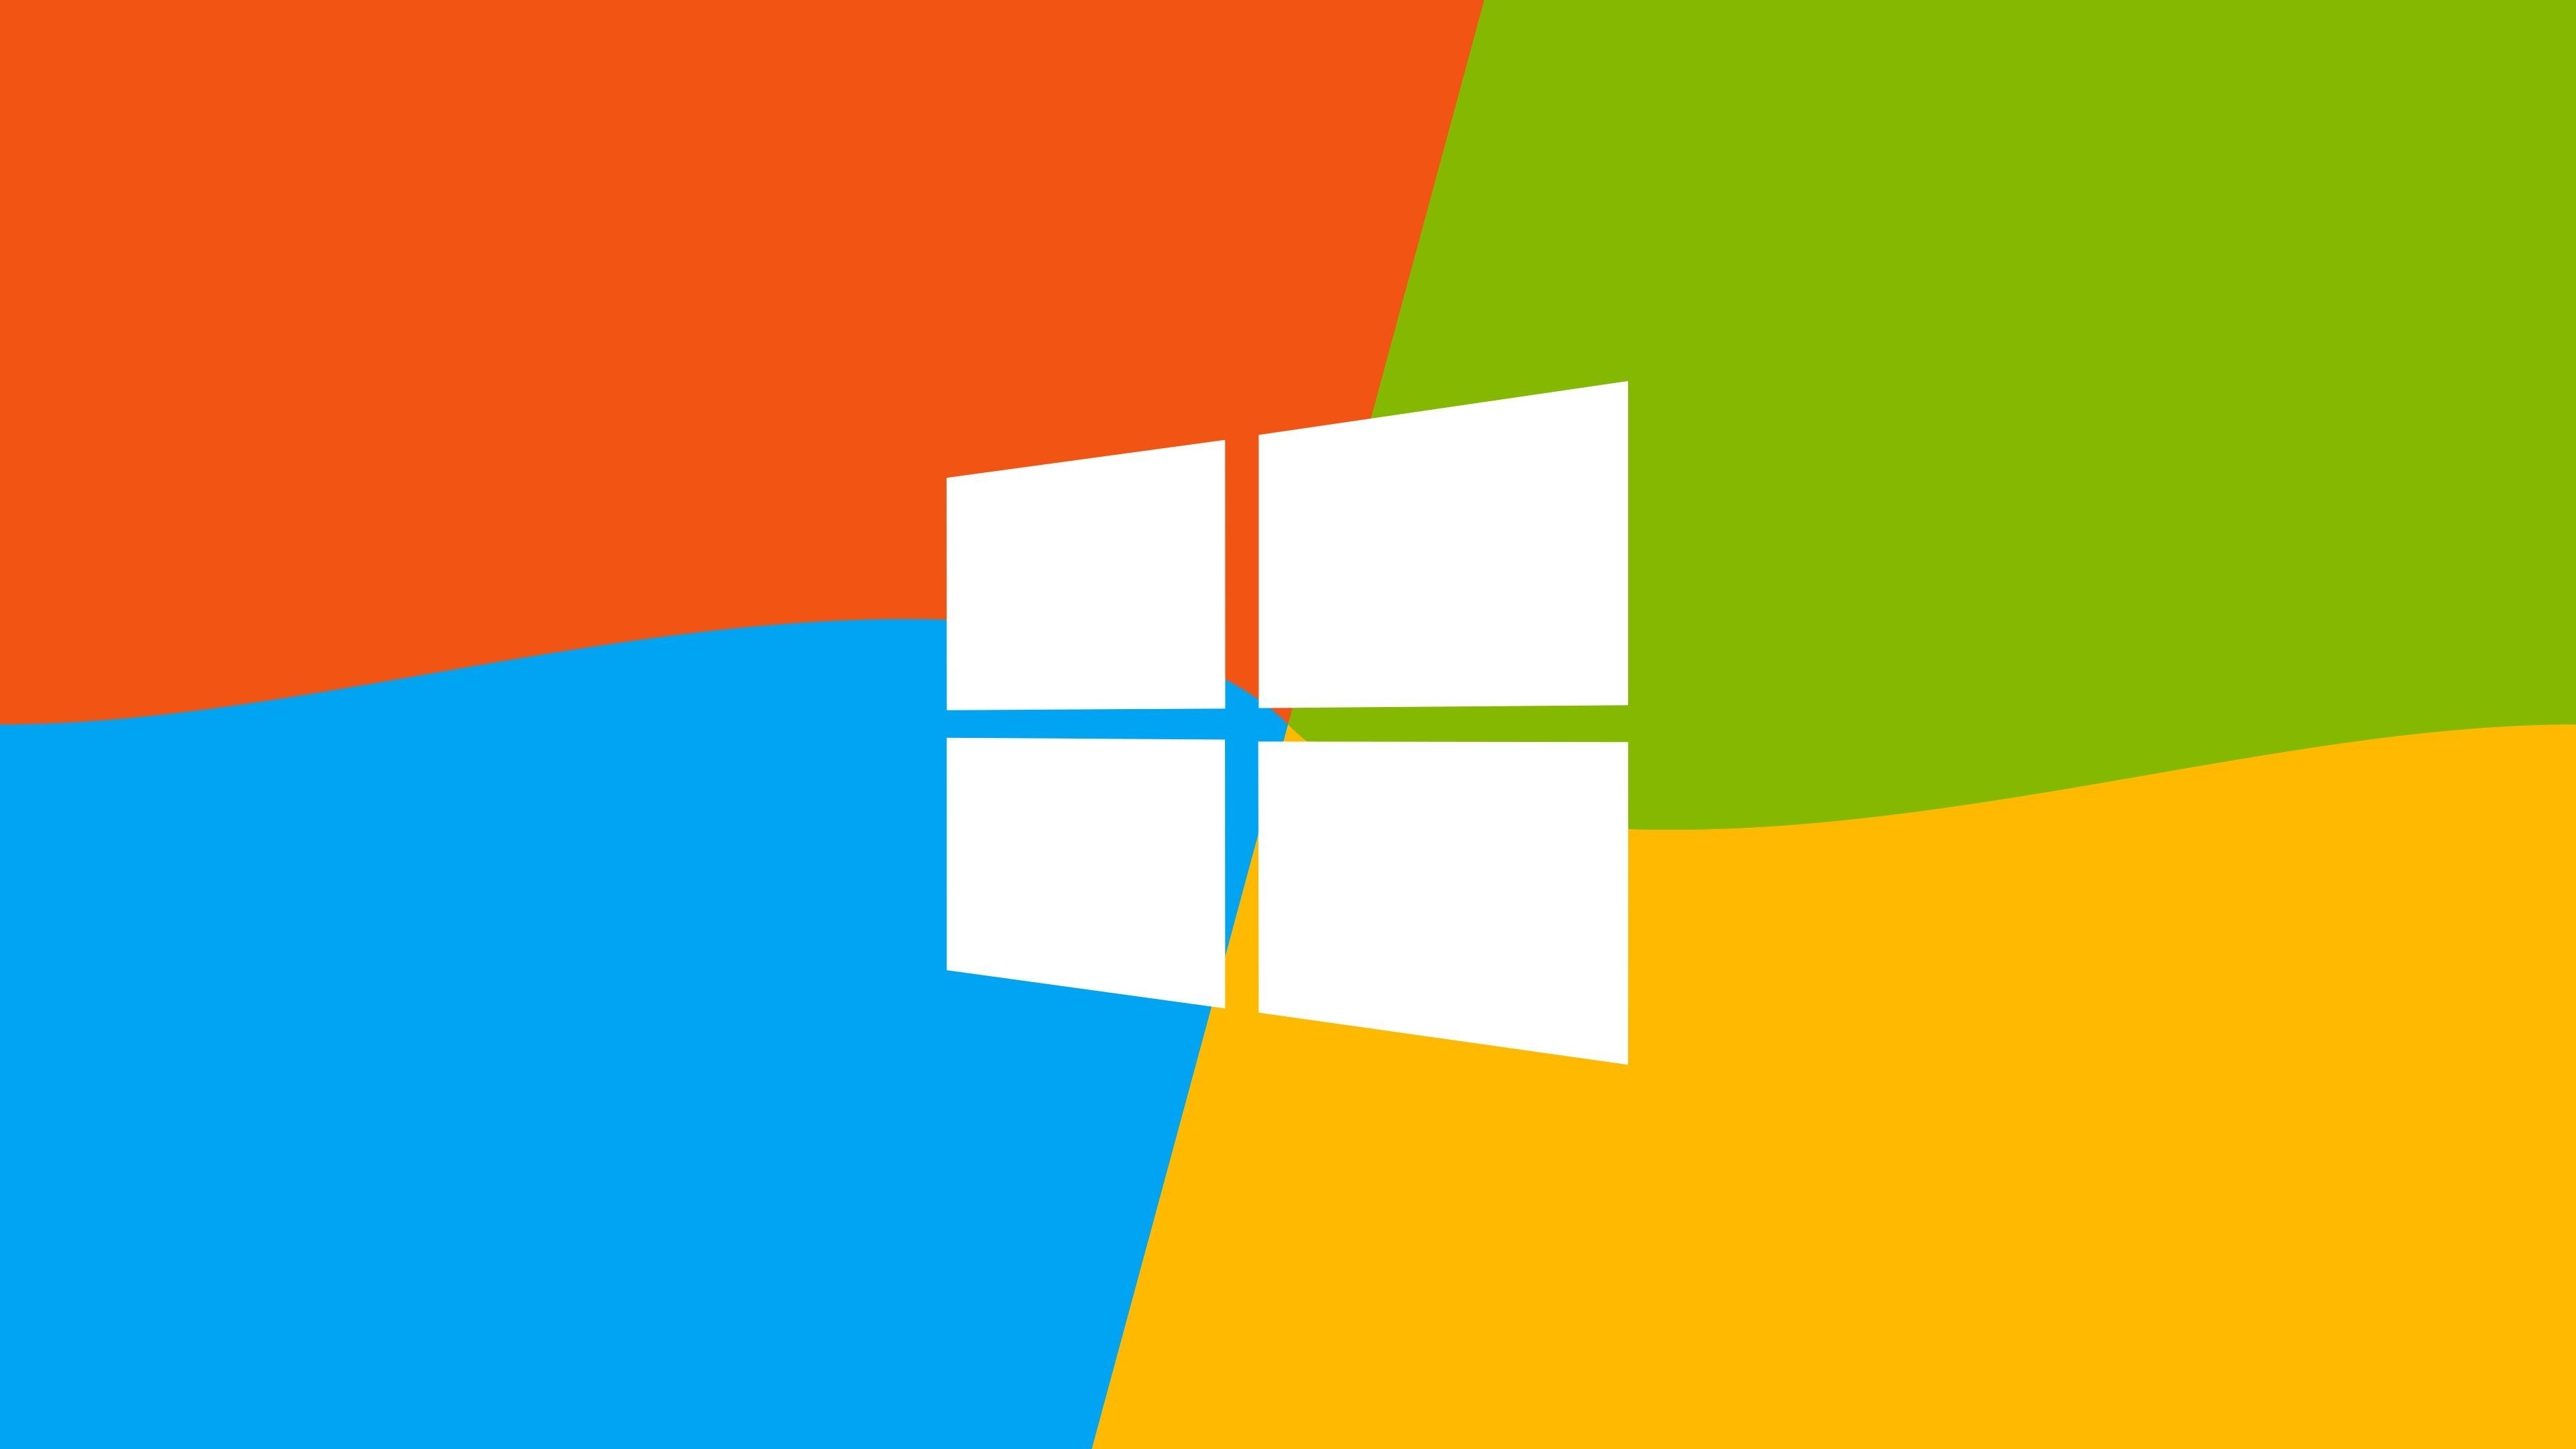 Windows 10 4k Wallpaper backgrounds. Seguidos n_n